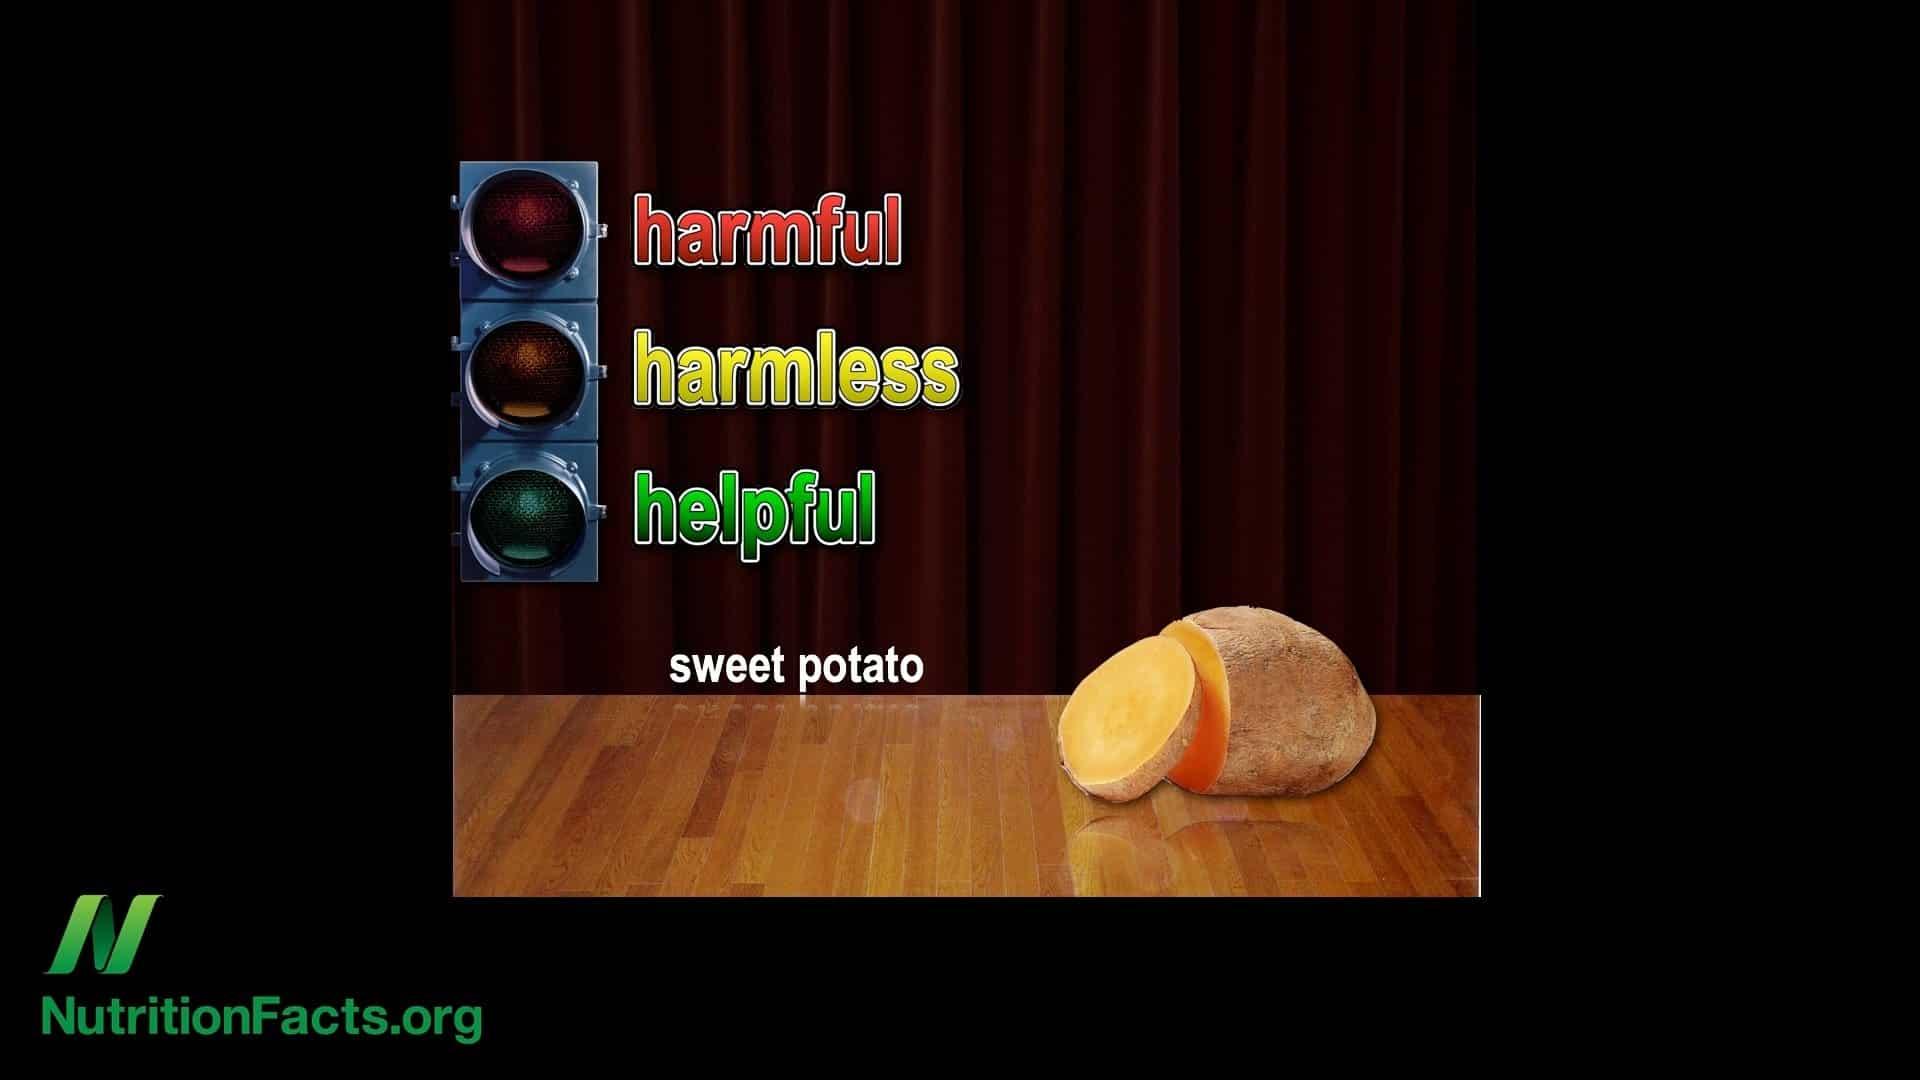 Toxins in Sweet Potatoes?